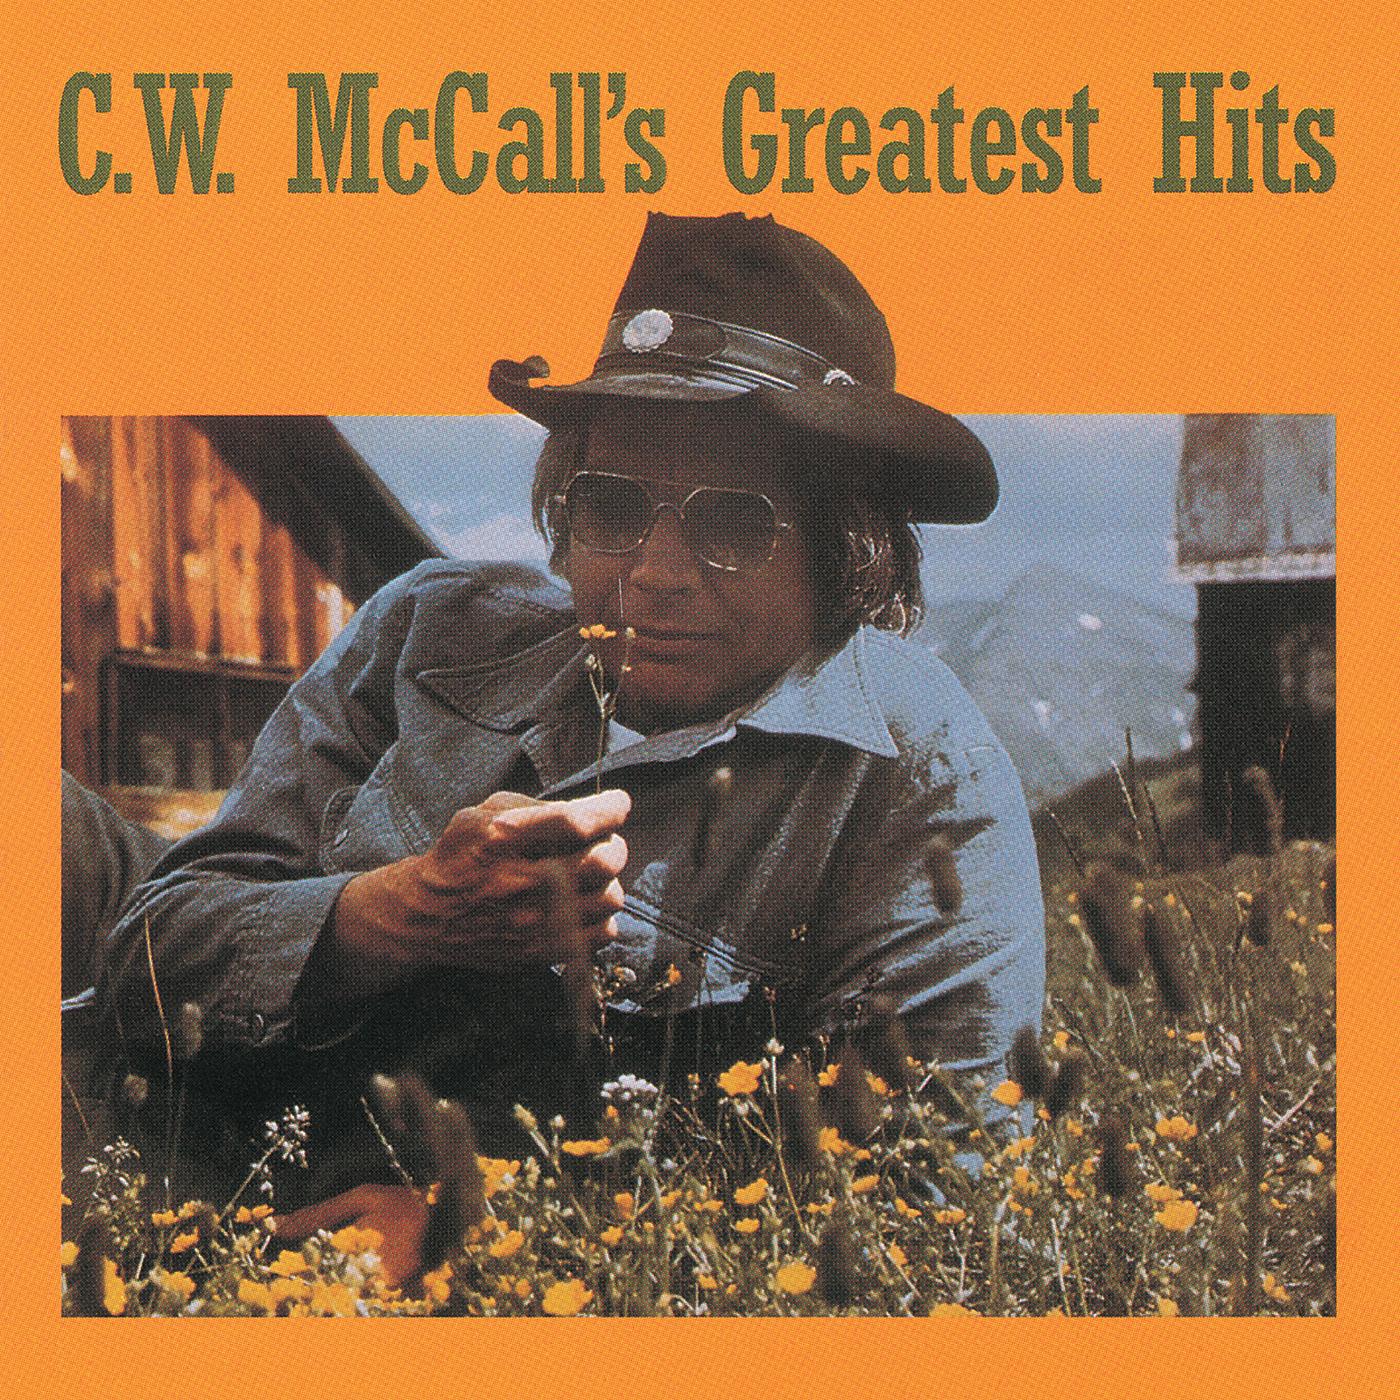 Listen Free to C.W. McCall - Convoy Radio | iHeartRadio